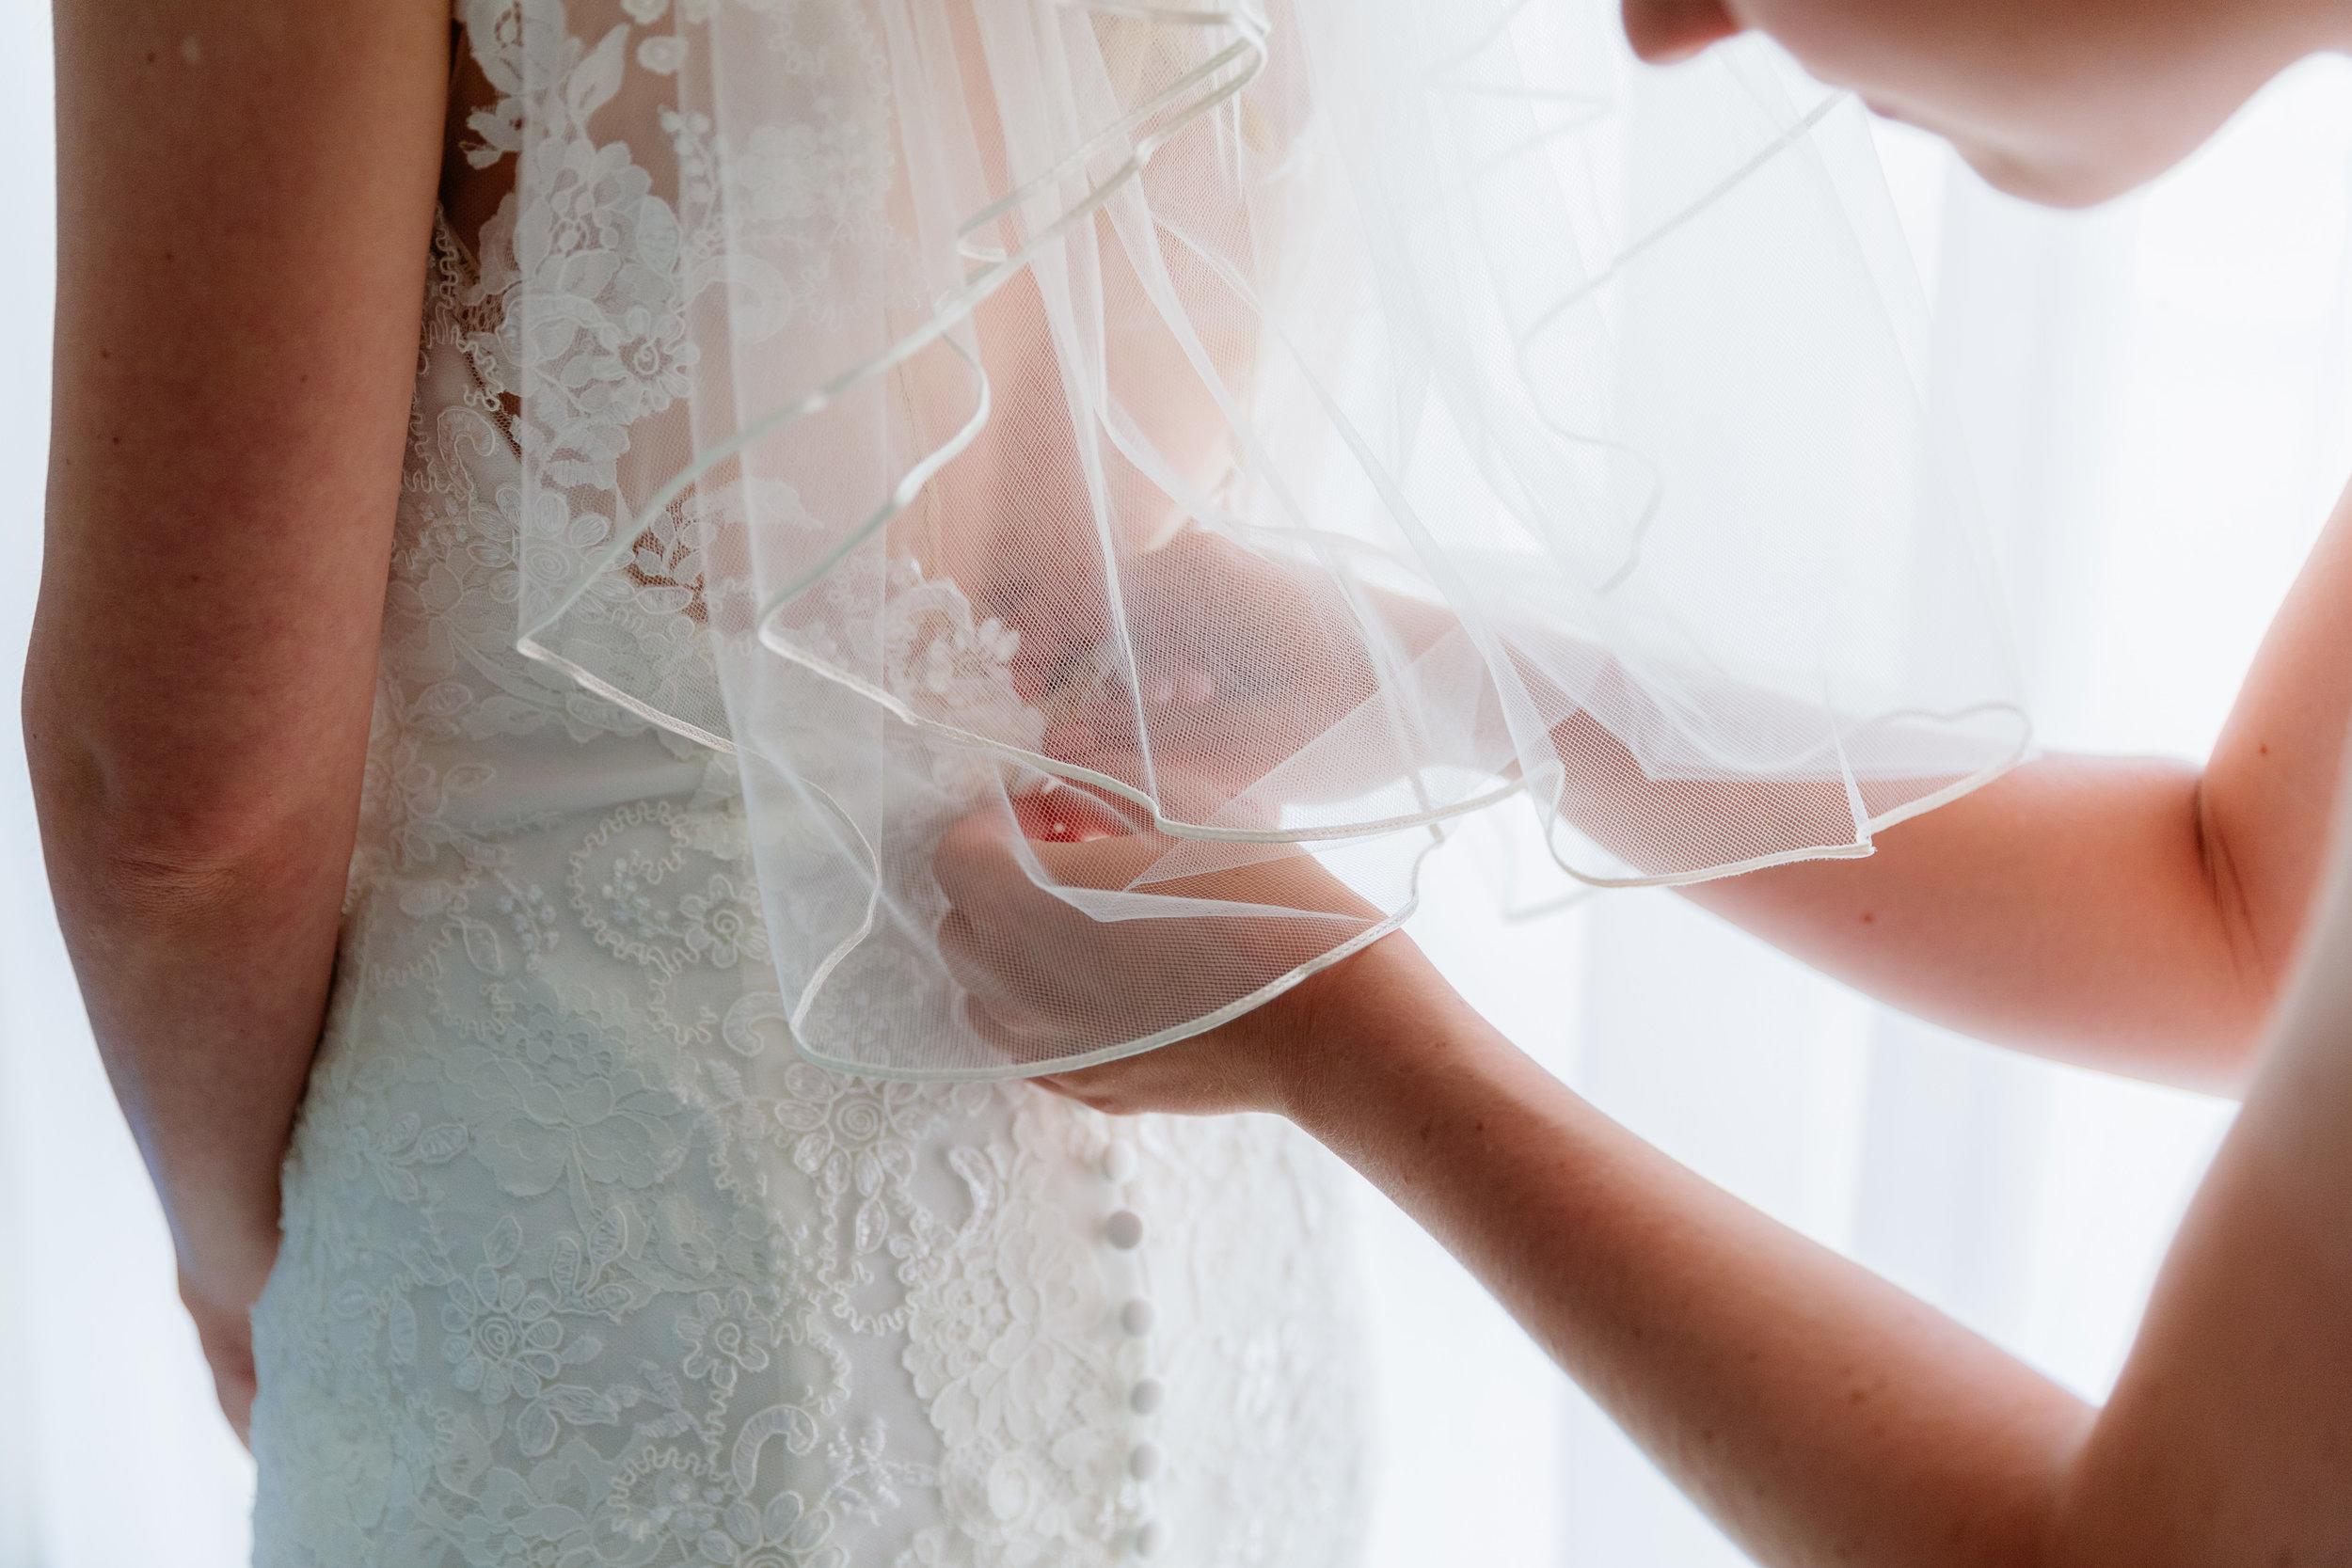 Malta_wedding_photography-32.jpg